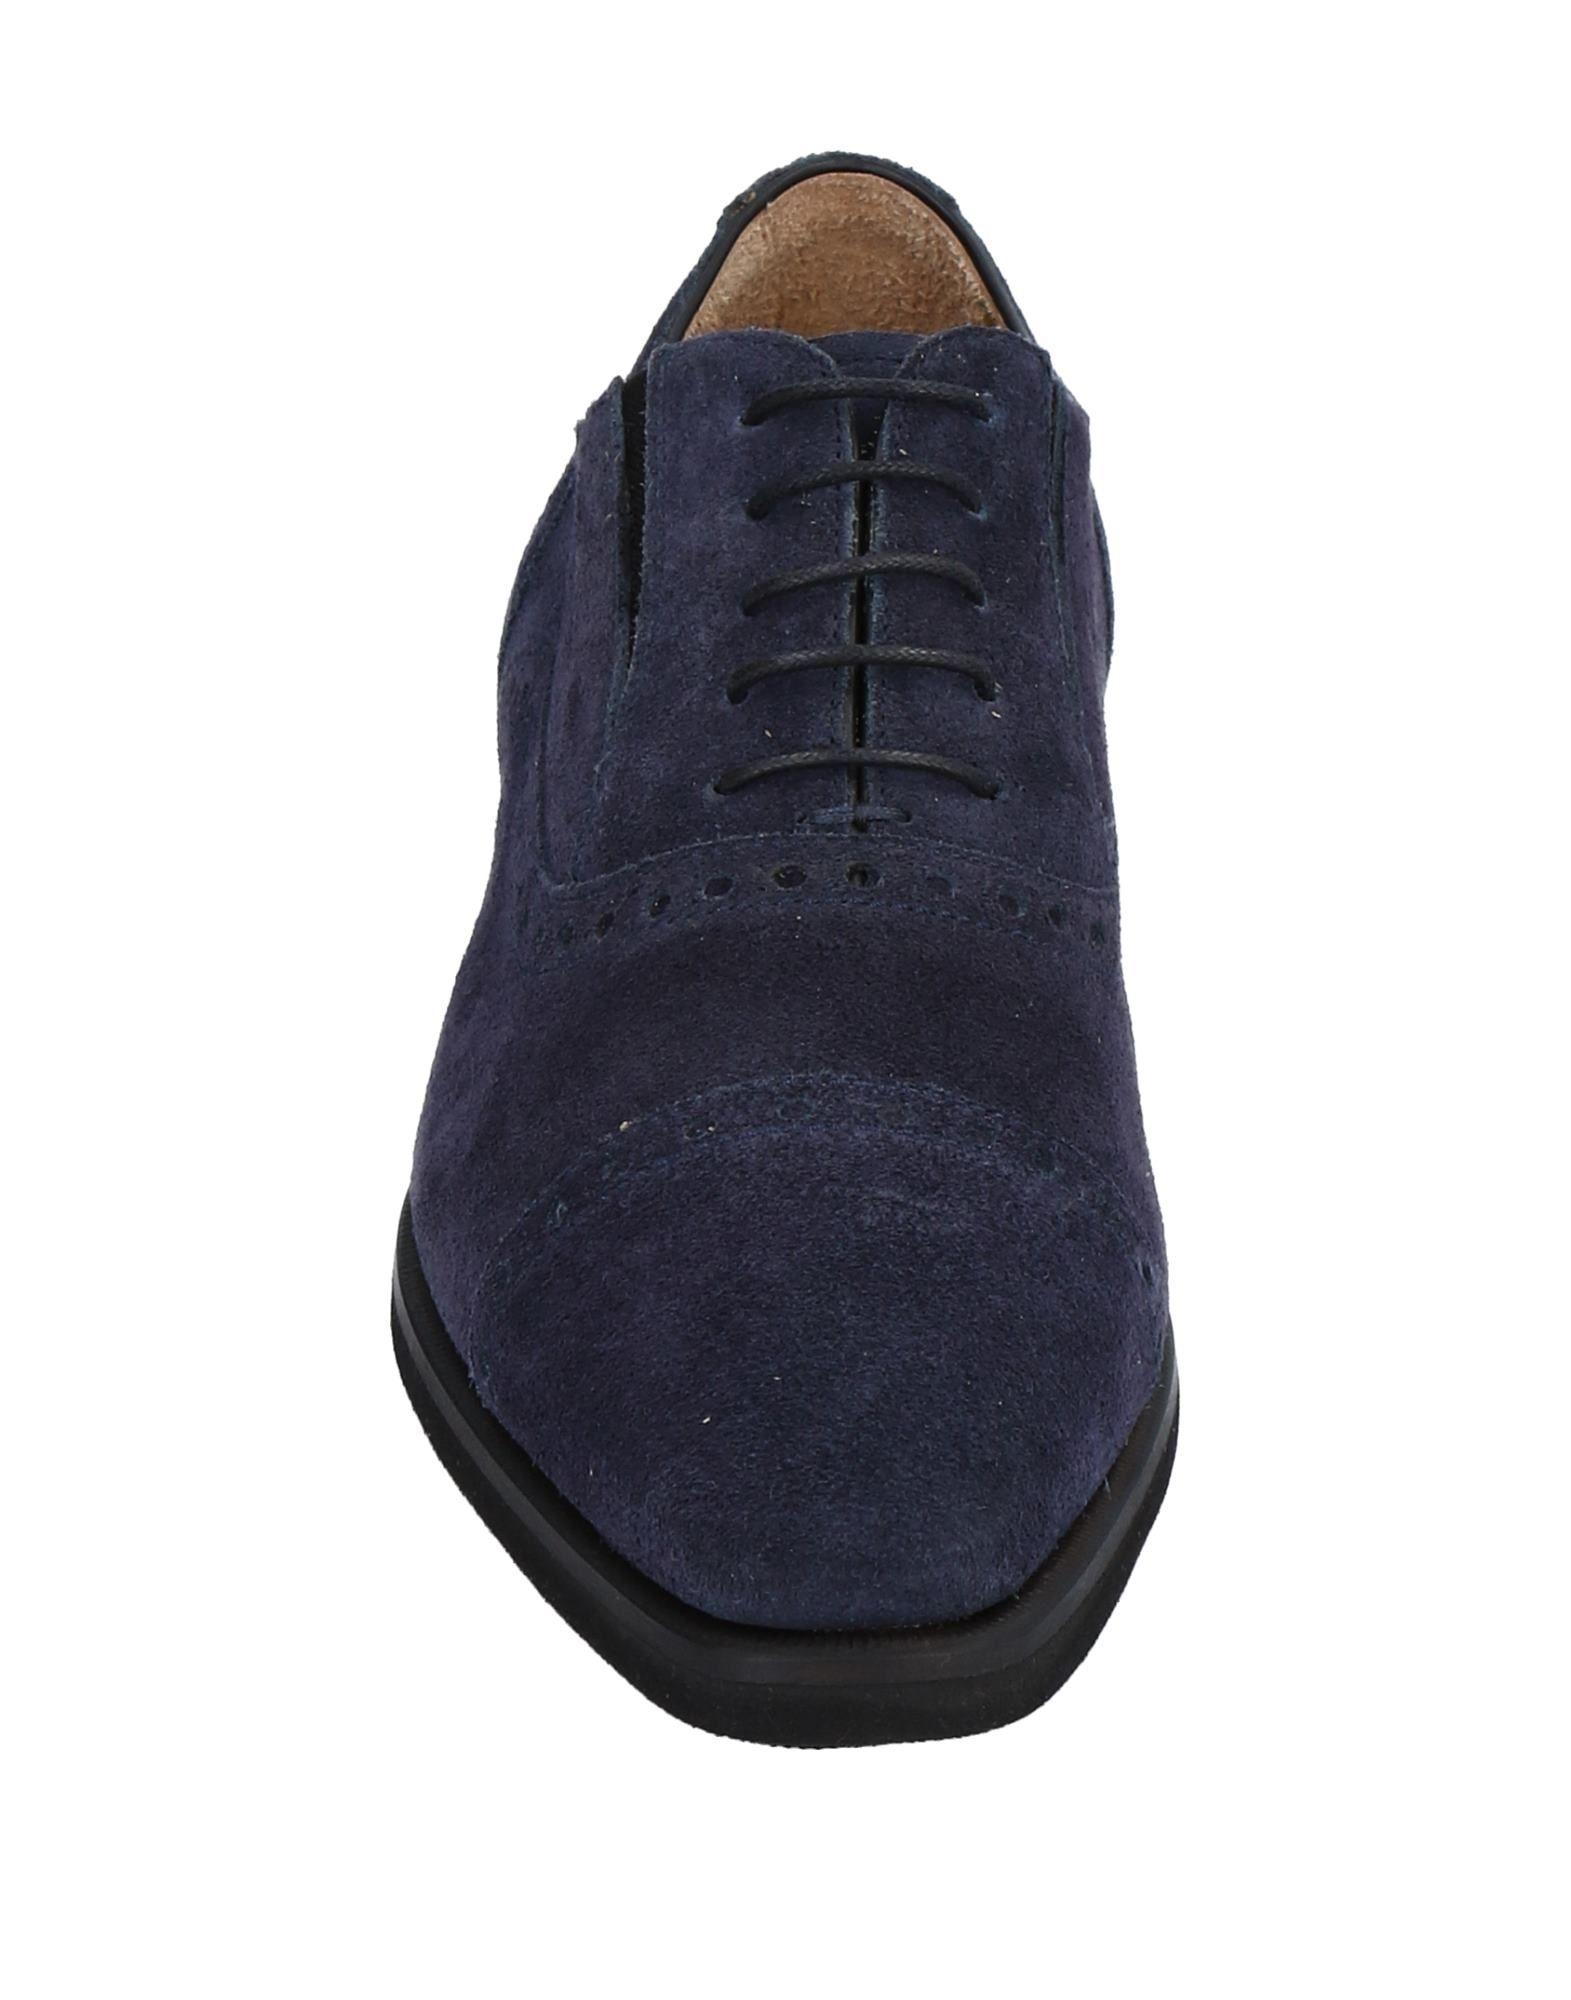 Rabatt Schnürschuhe echte Schuhe Angelo Nardelli Schnürschuhe Rabatt Herren  11535917US e4dbaf